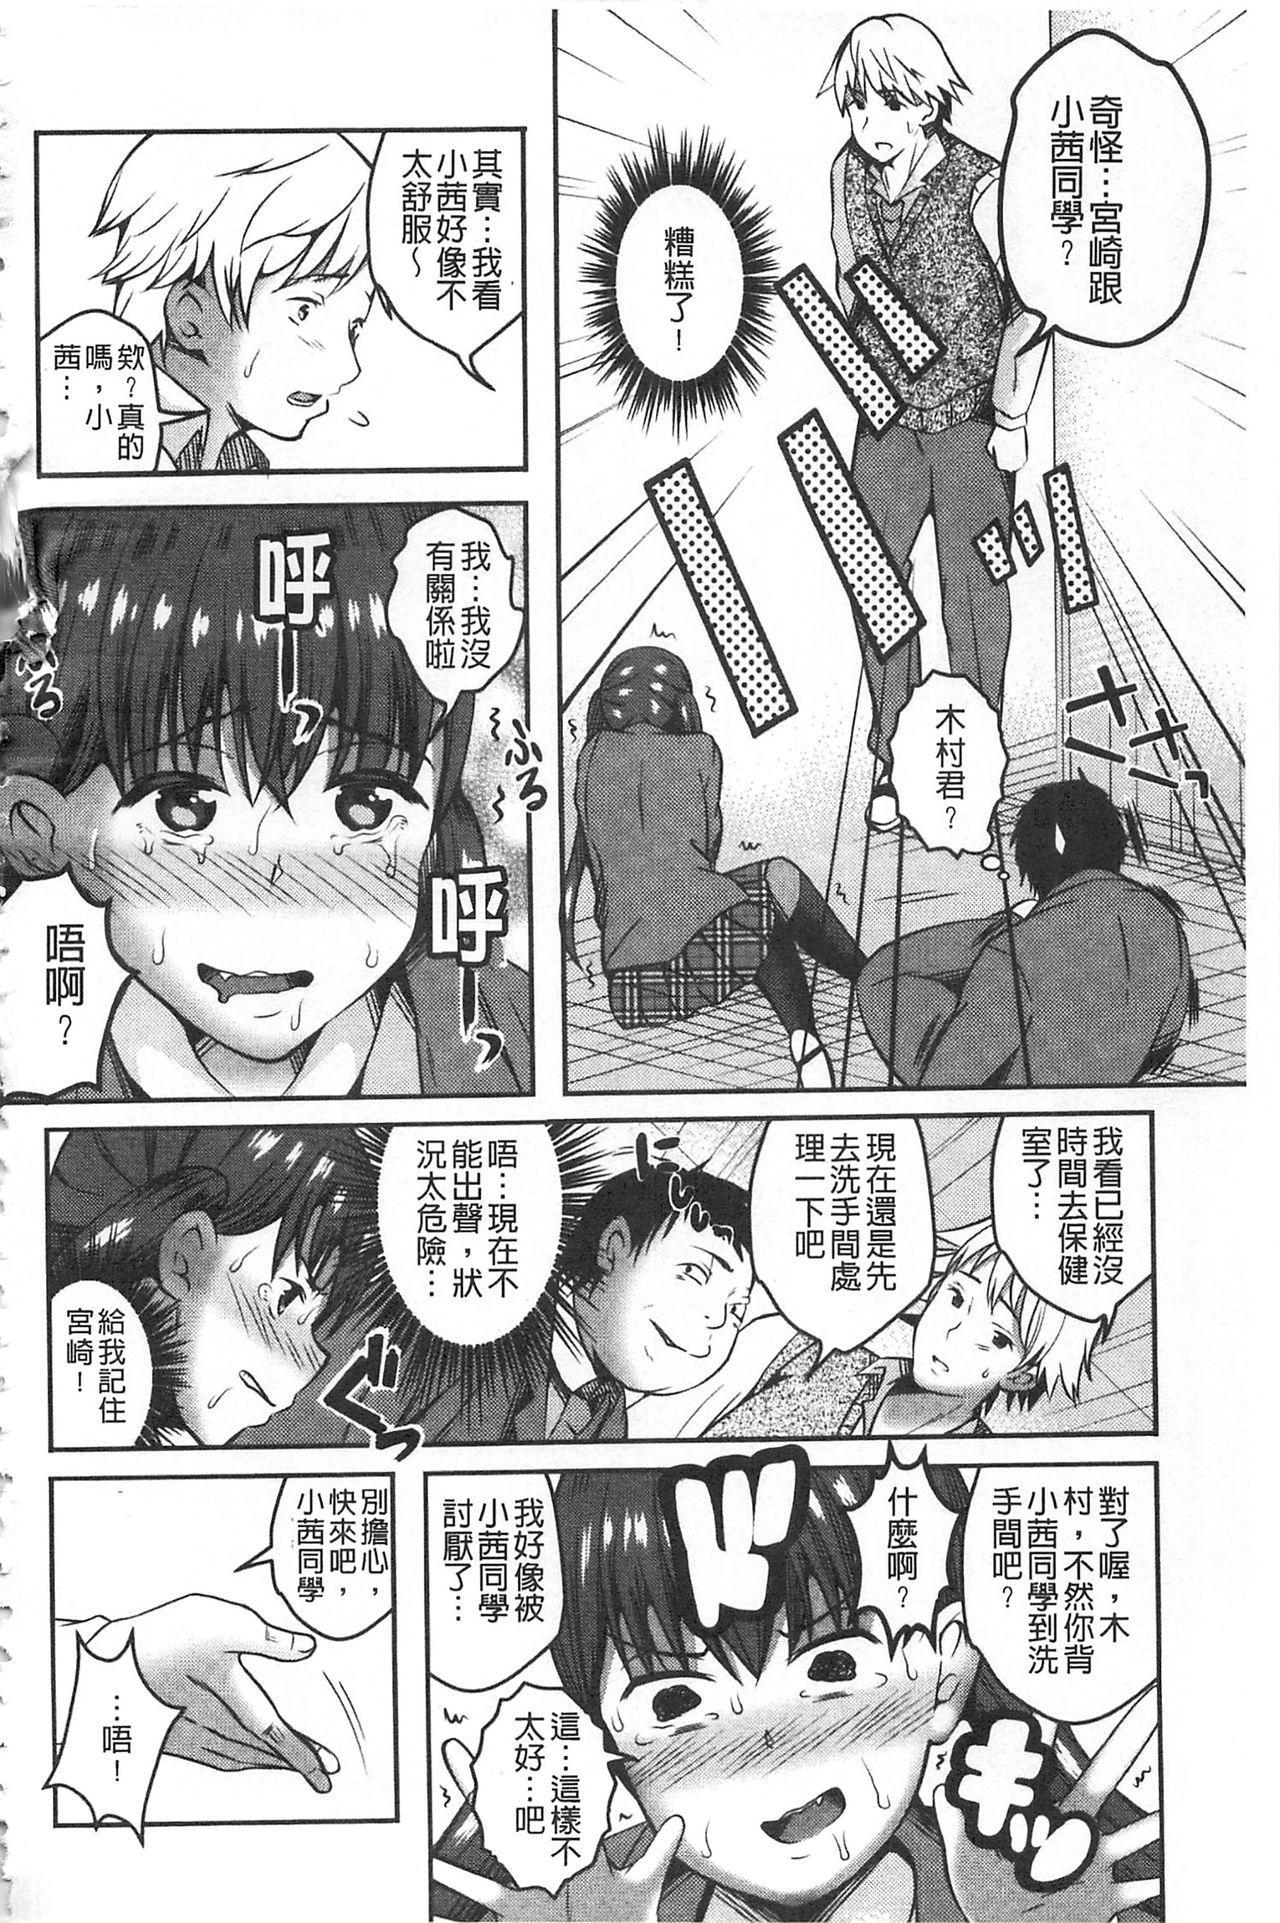 Kanjuku Otome no Odoshikata | 姦熟乙女的脅迫法 151